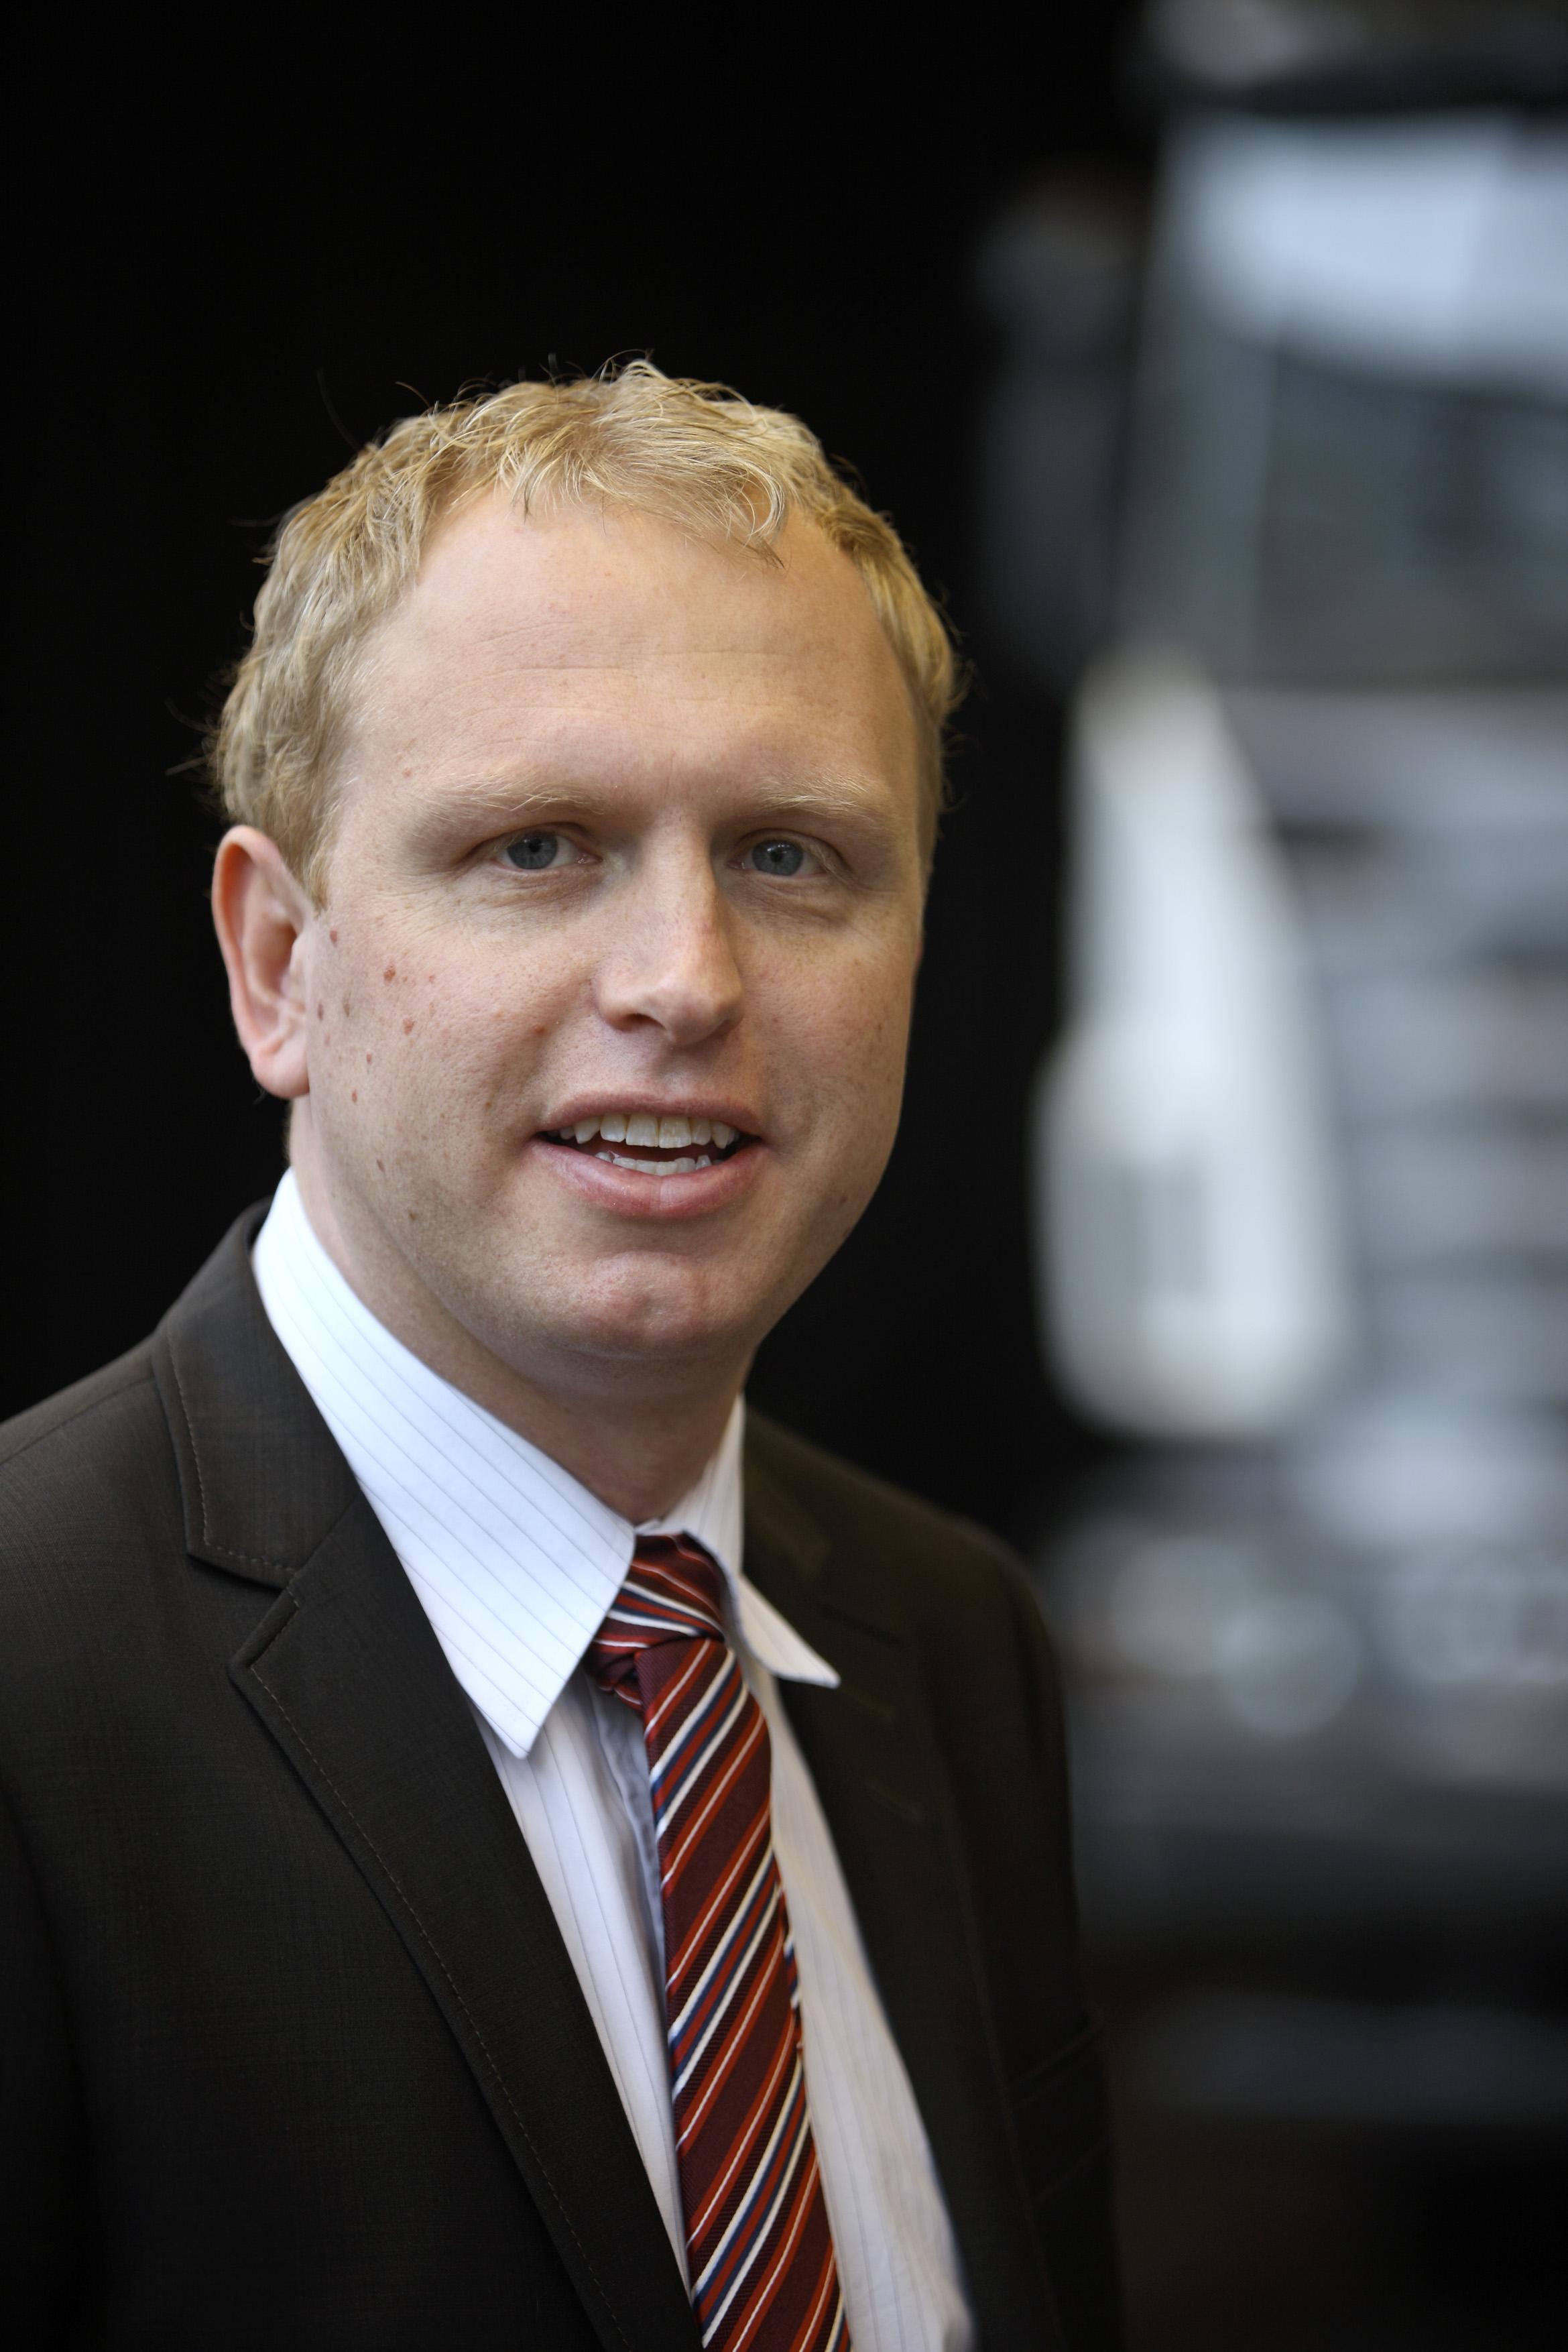 Henrik Henriksson